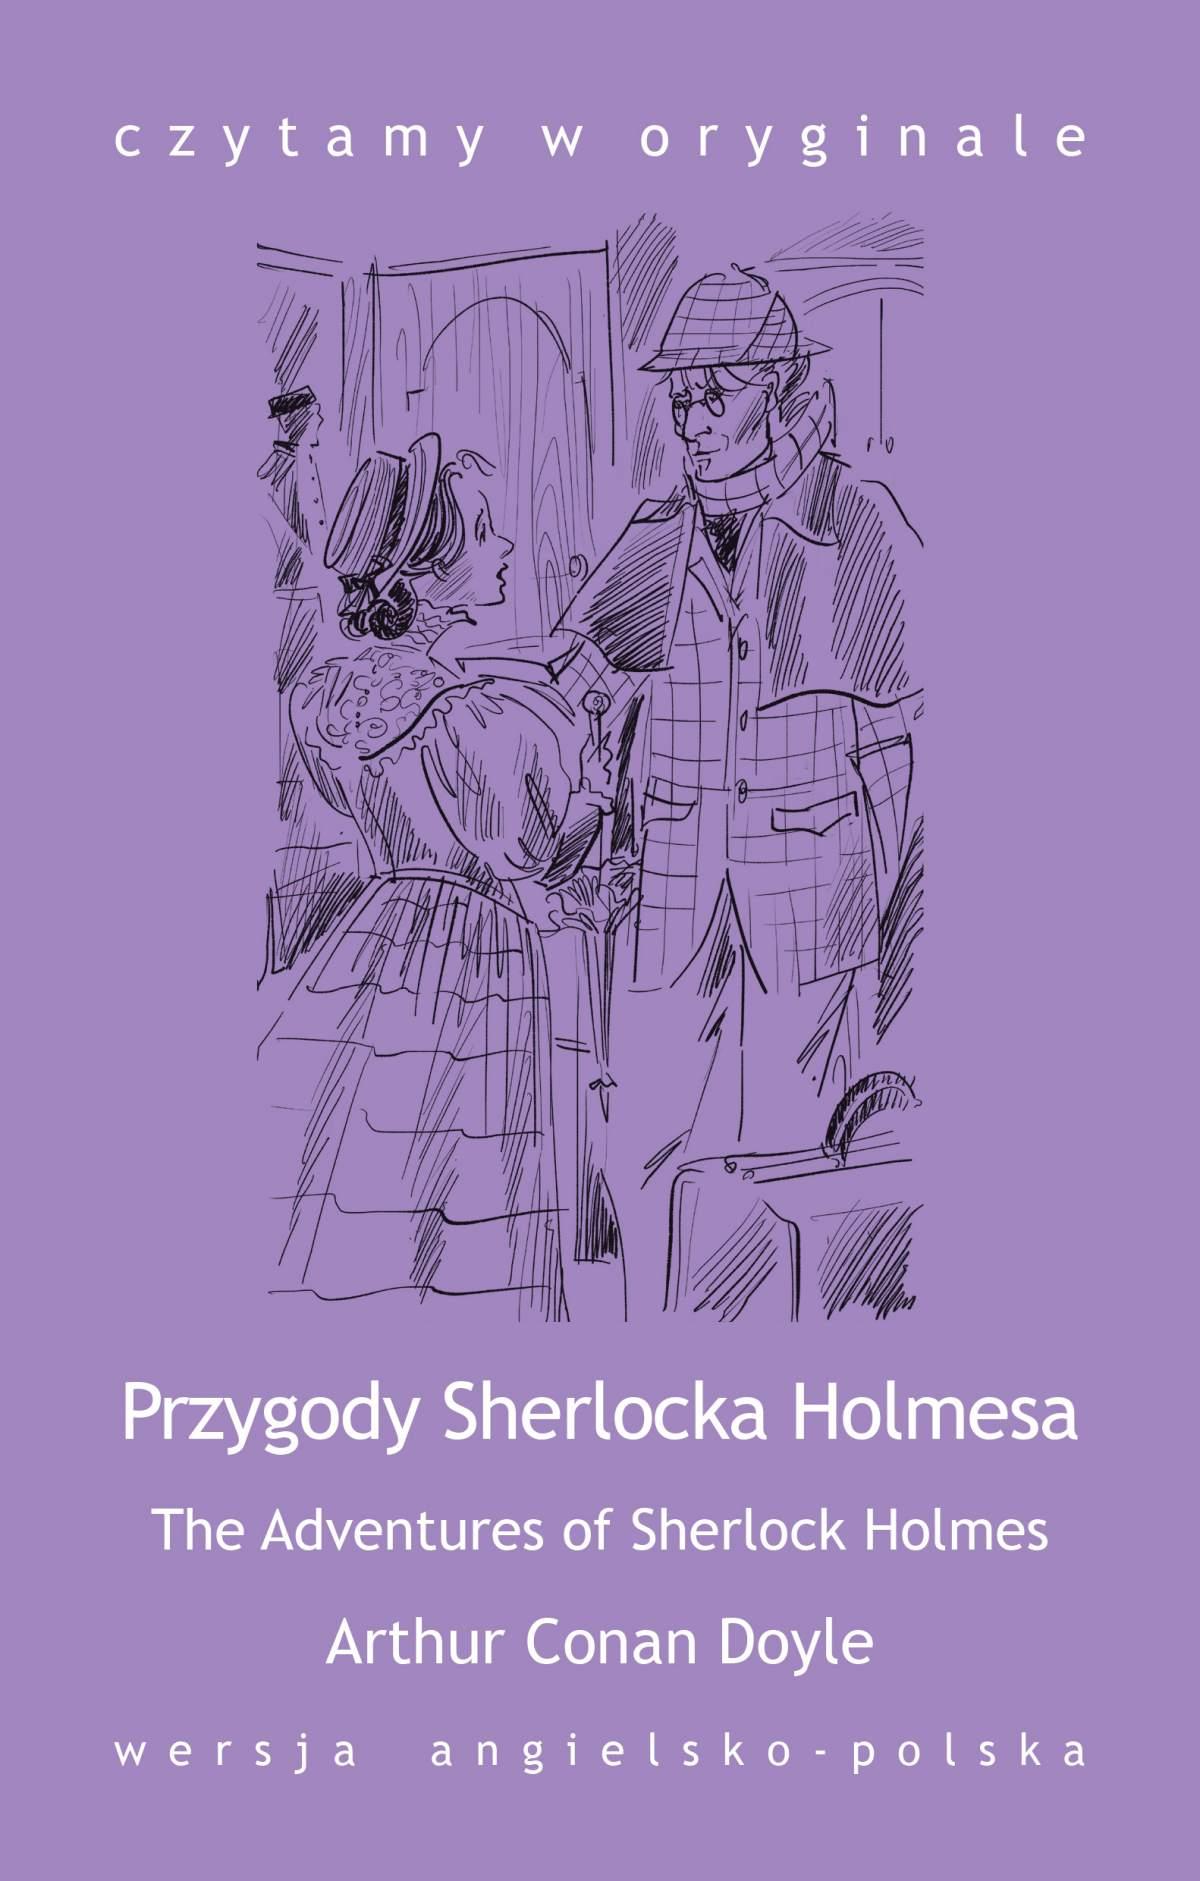 """The Adventures of Sherlock Holmes / Przygody Sherlocka Holmesa"" - Ebook (Książka EPUB) do pobrania w formacie EPUB"